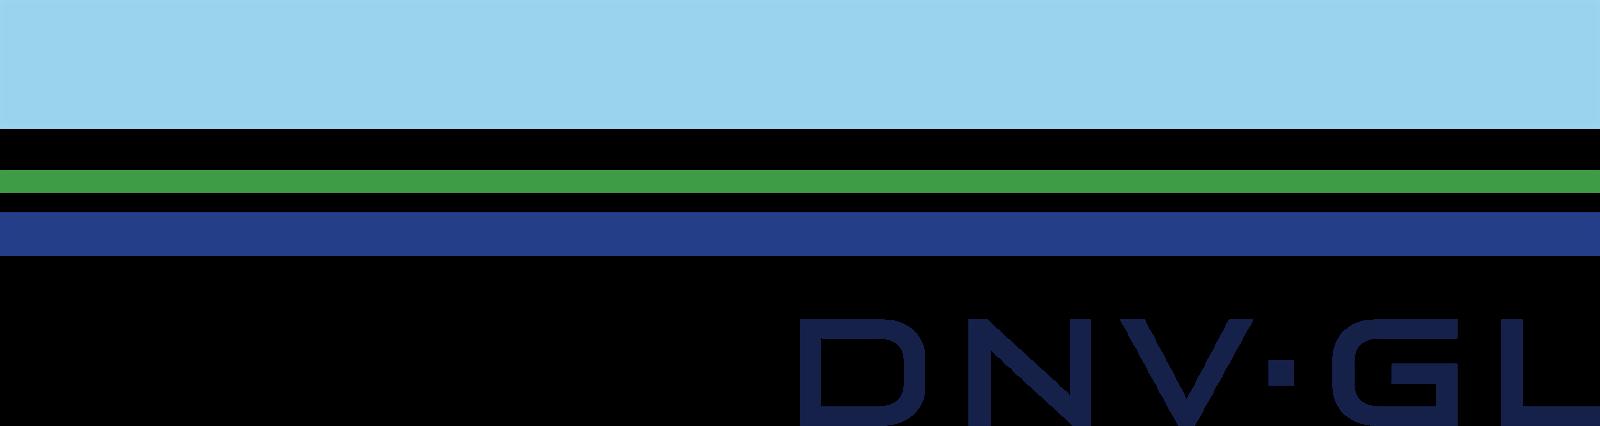 DNV GL logo 2013